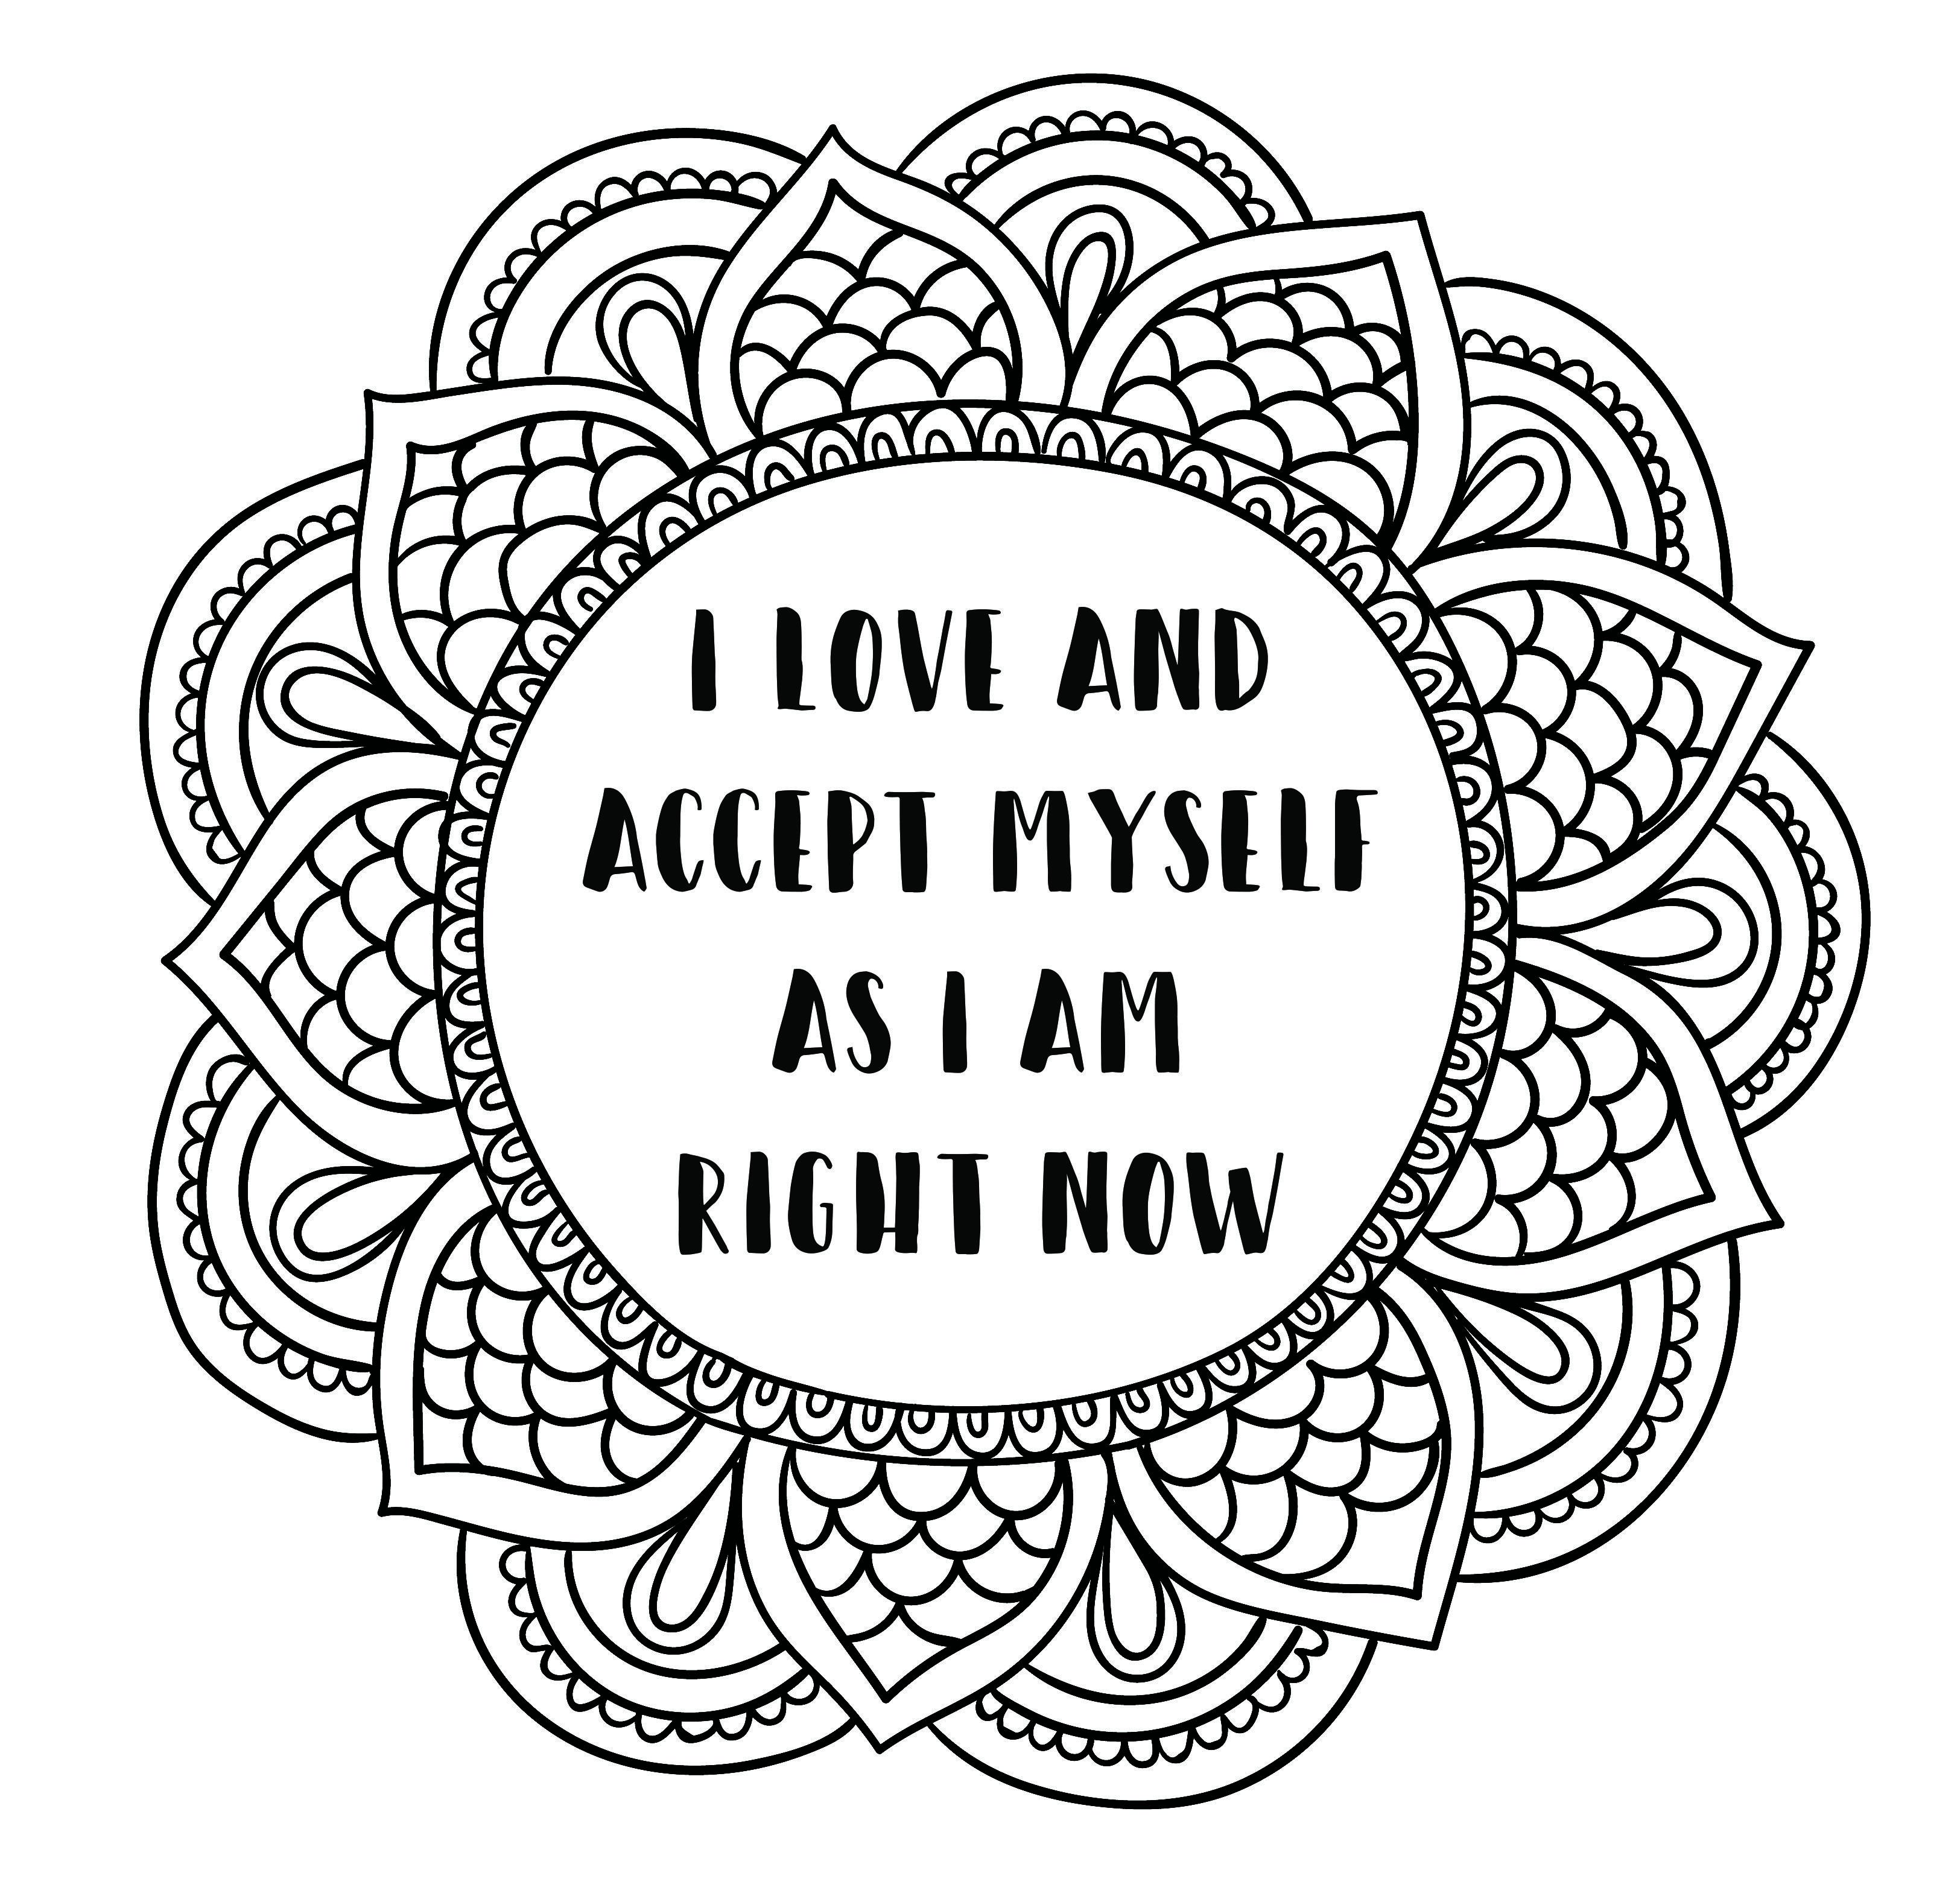 Mandala Style Coloring Page Printable Self Love Affirmation